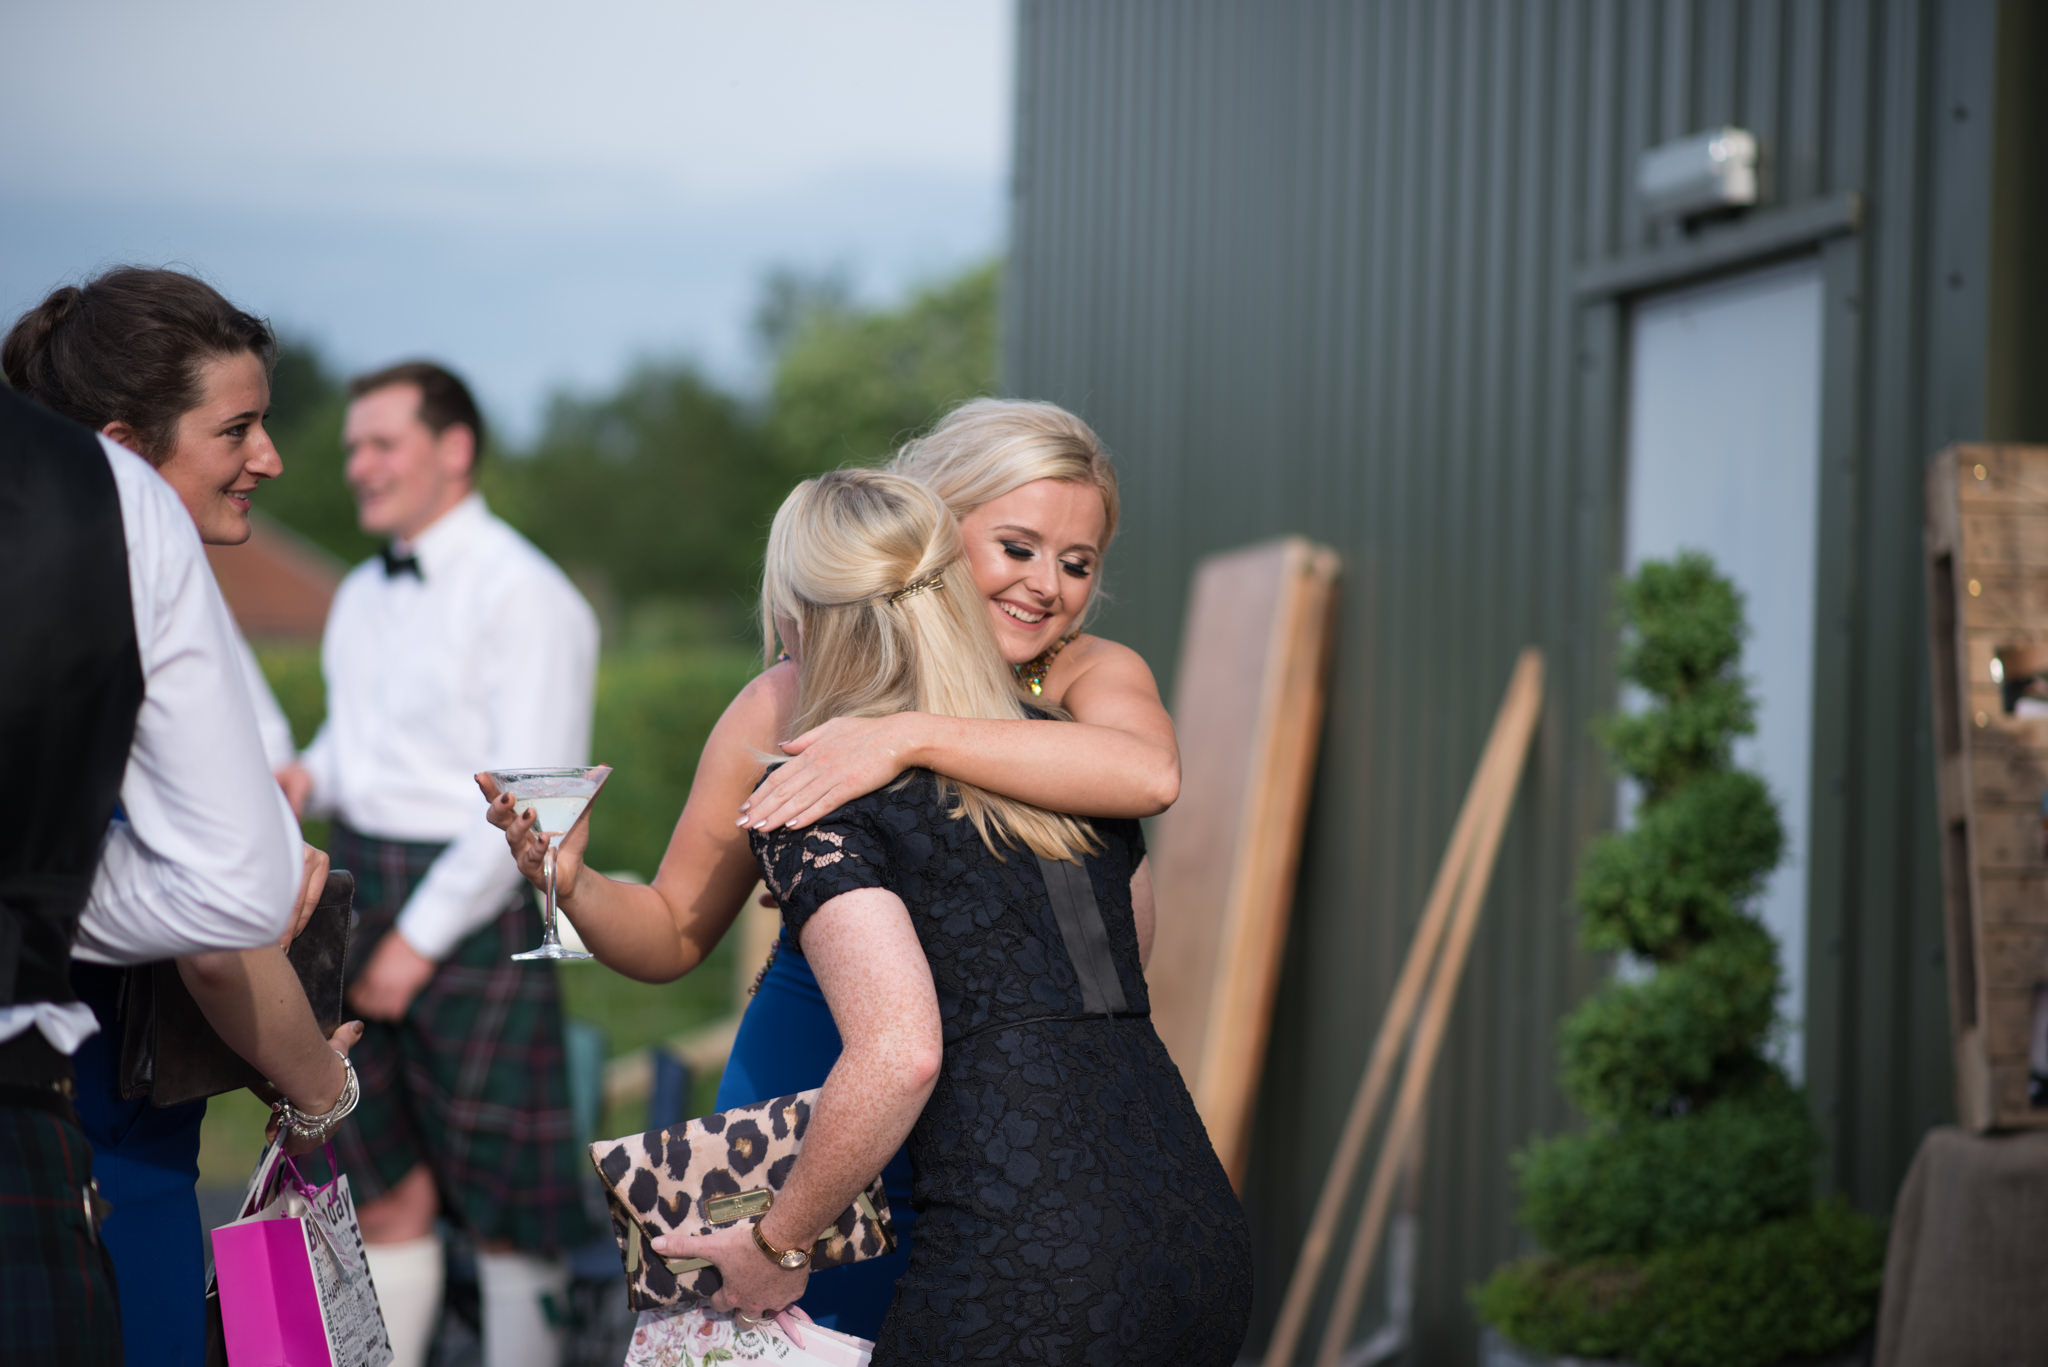 Anna's 21st birthday party - © Juliebee - www.juliebee.co.uk